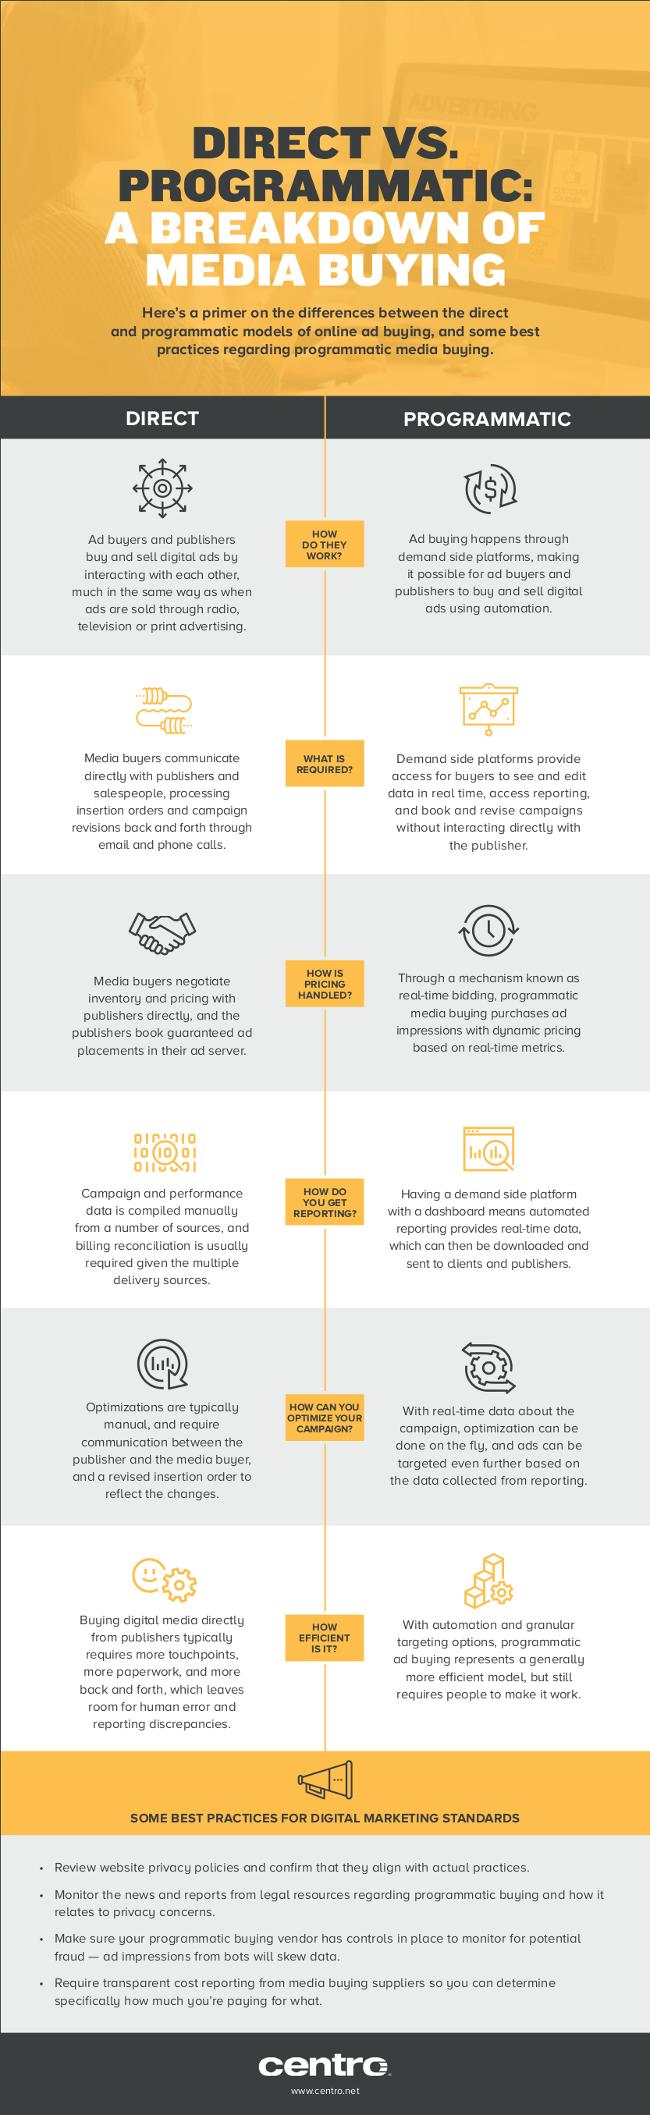 Direct vs. Programmatic: A Breakdown of Media Buying